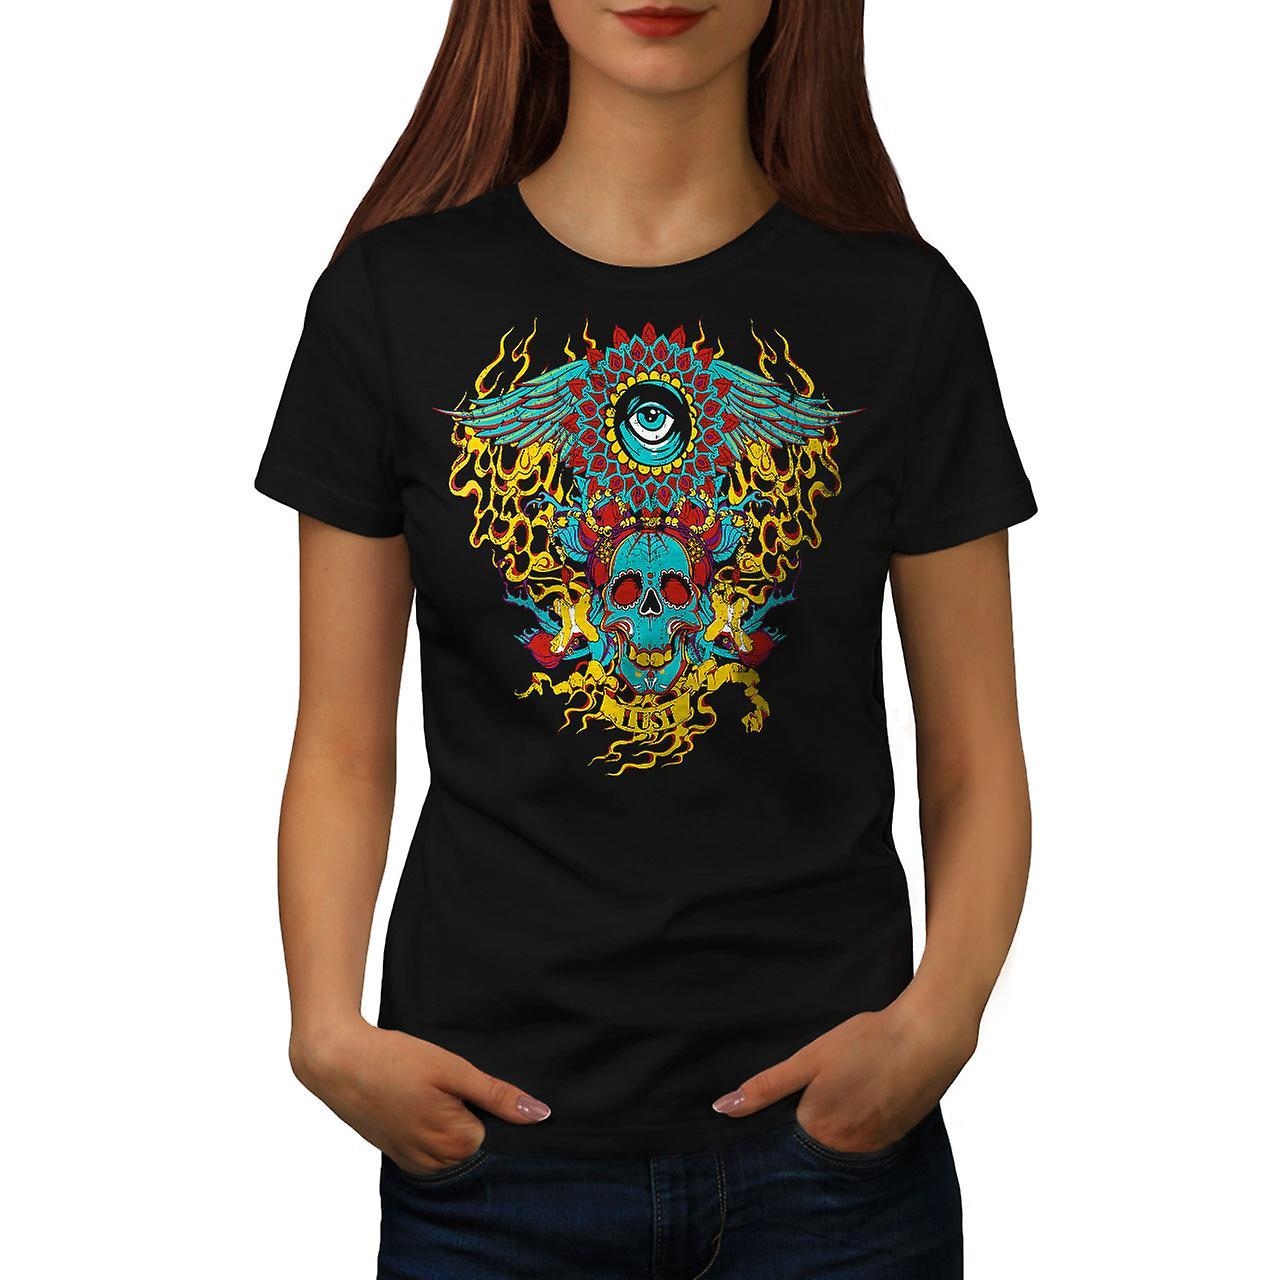 Heart Flame Eye Skull Women Black T-shirt   Wellcoda